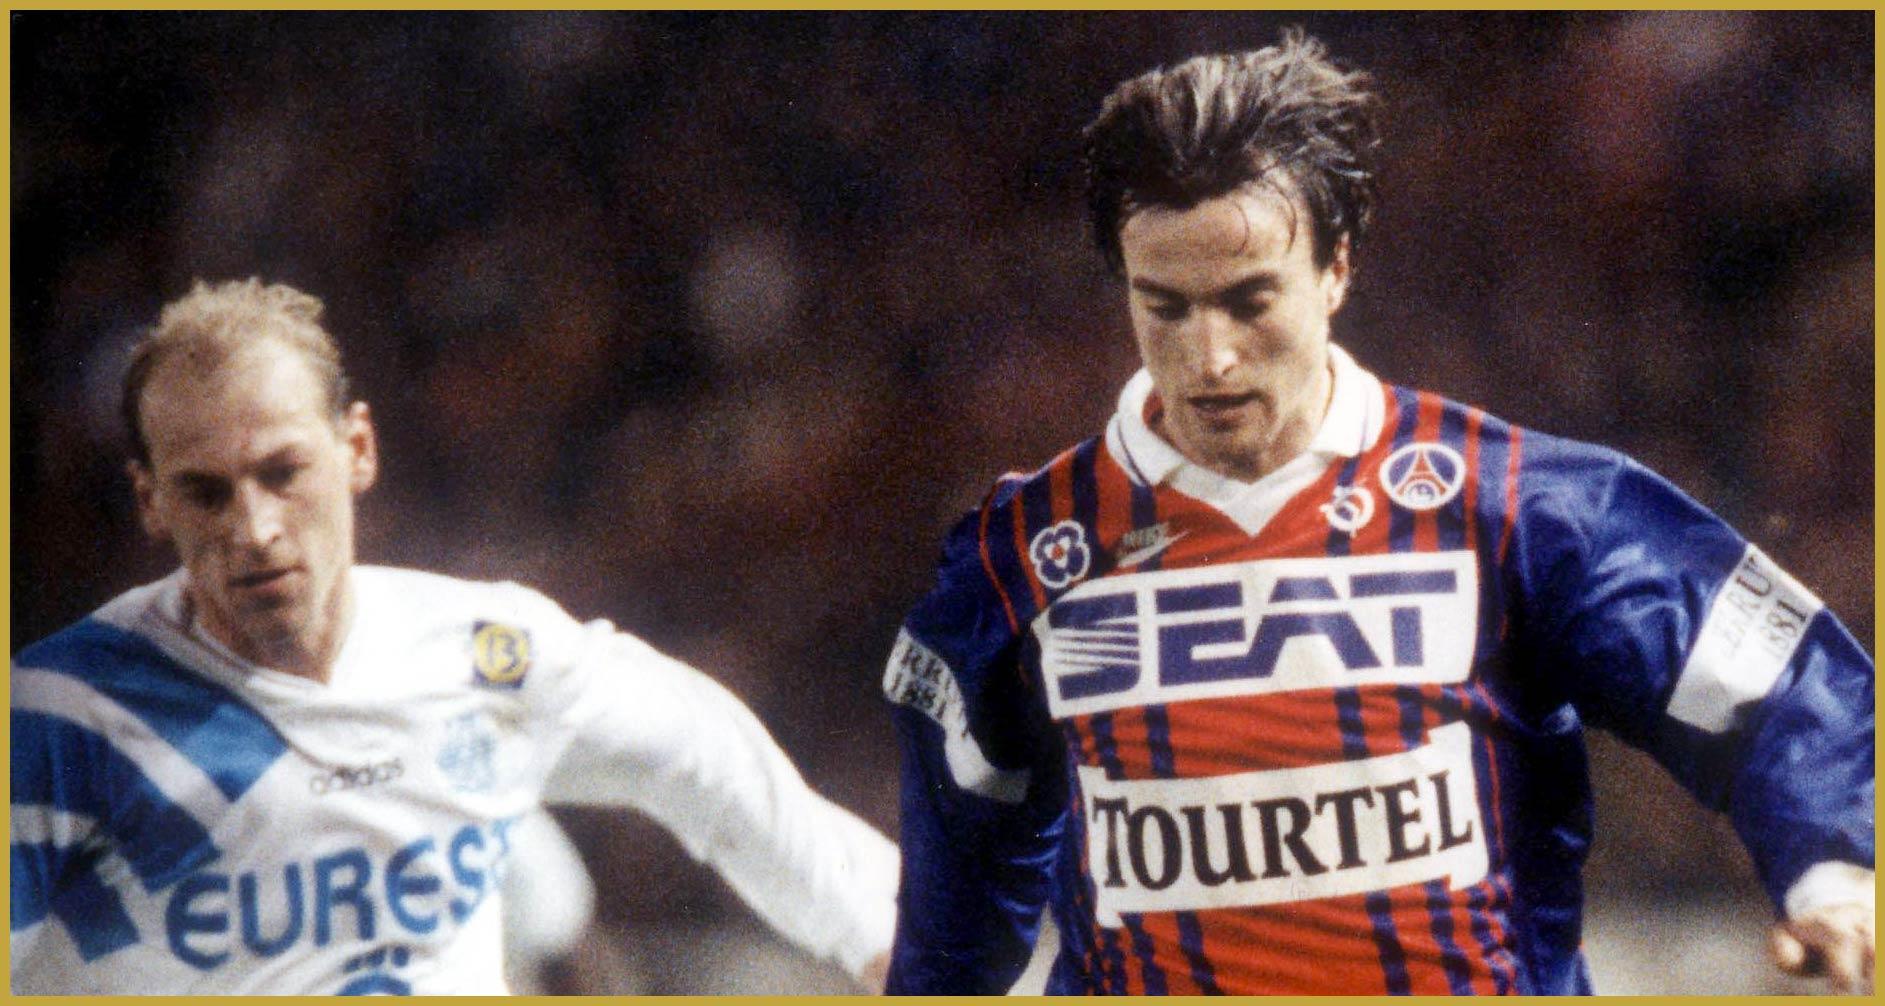 ITW Mathieu Faure Virage PSG